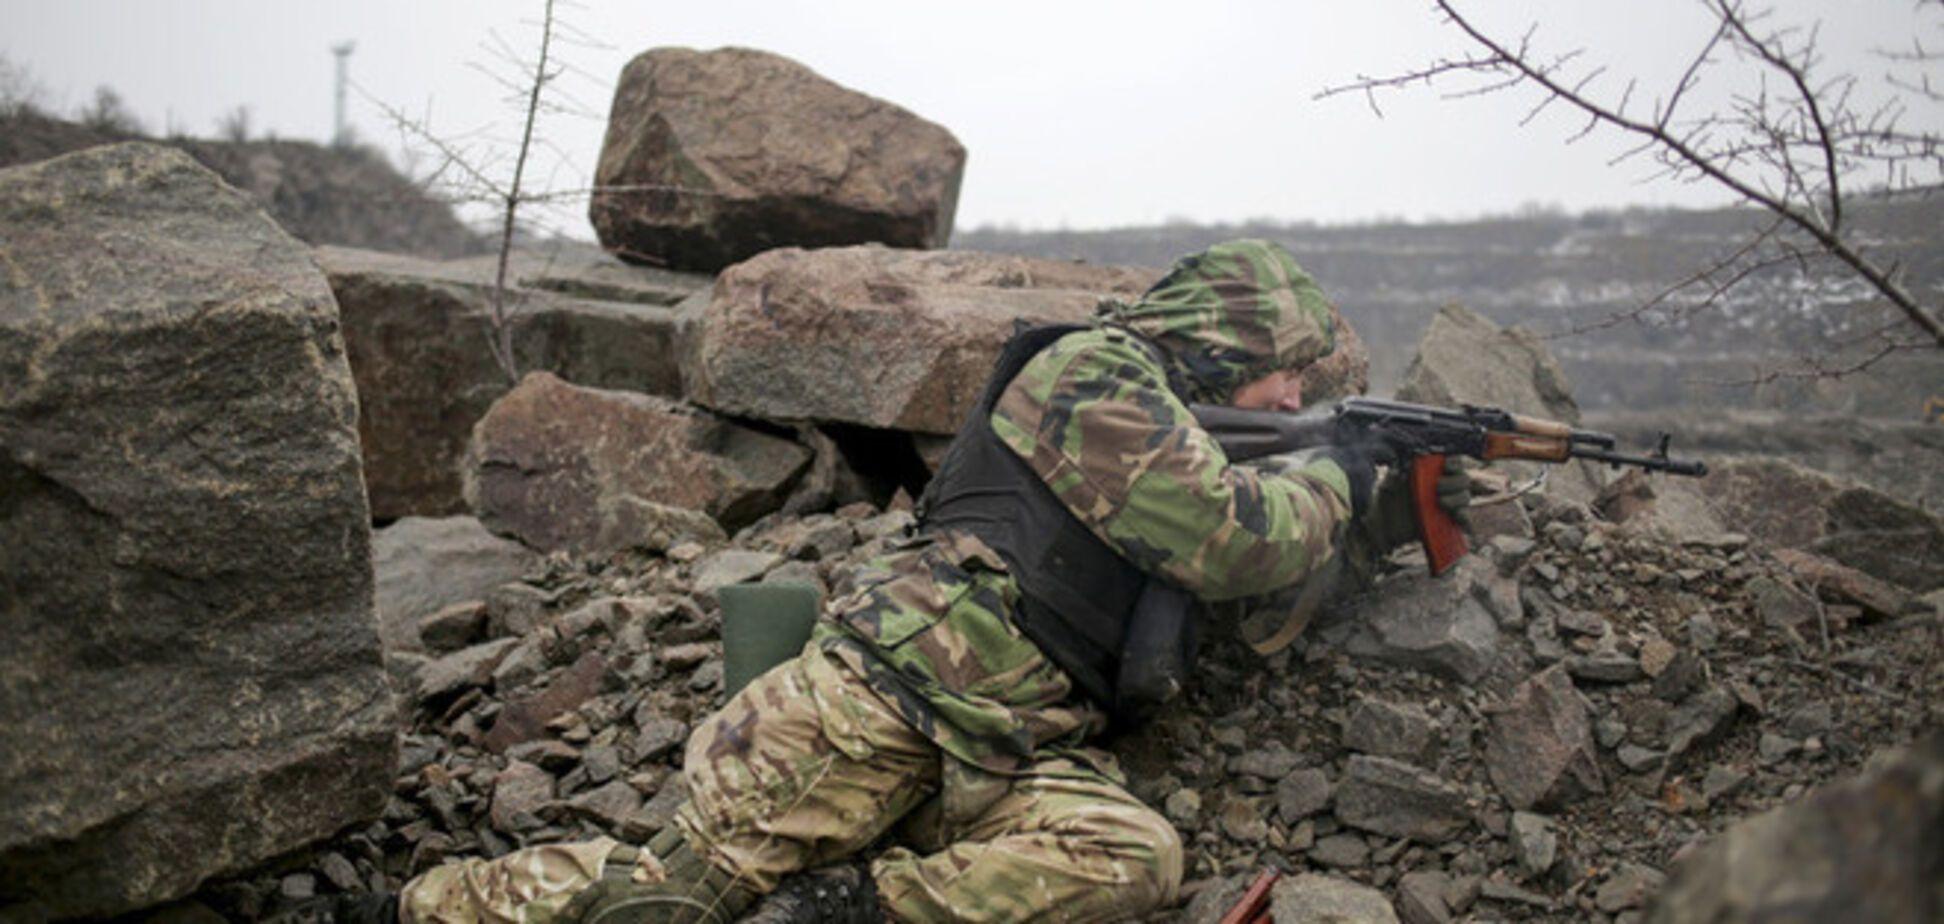 Ветеран спецназа назвал два варианта прекращения войны на Донбассе